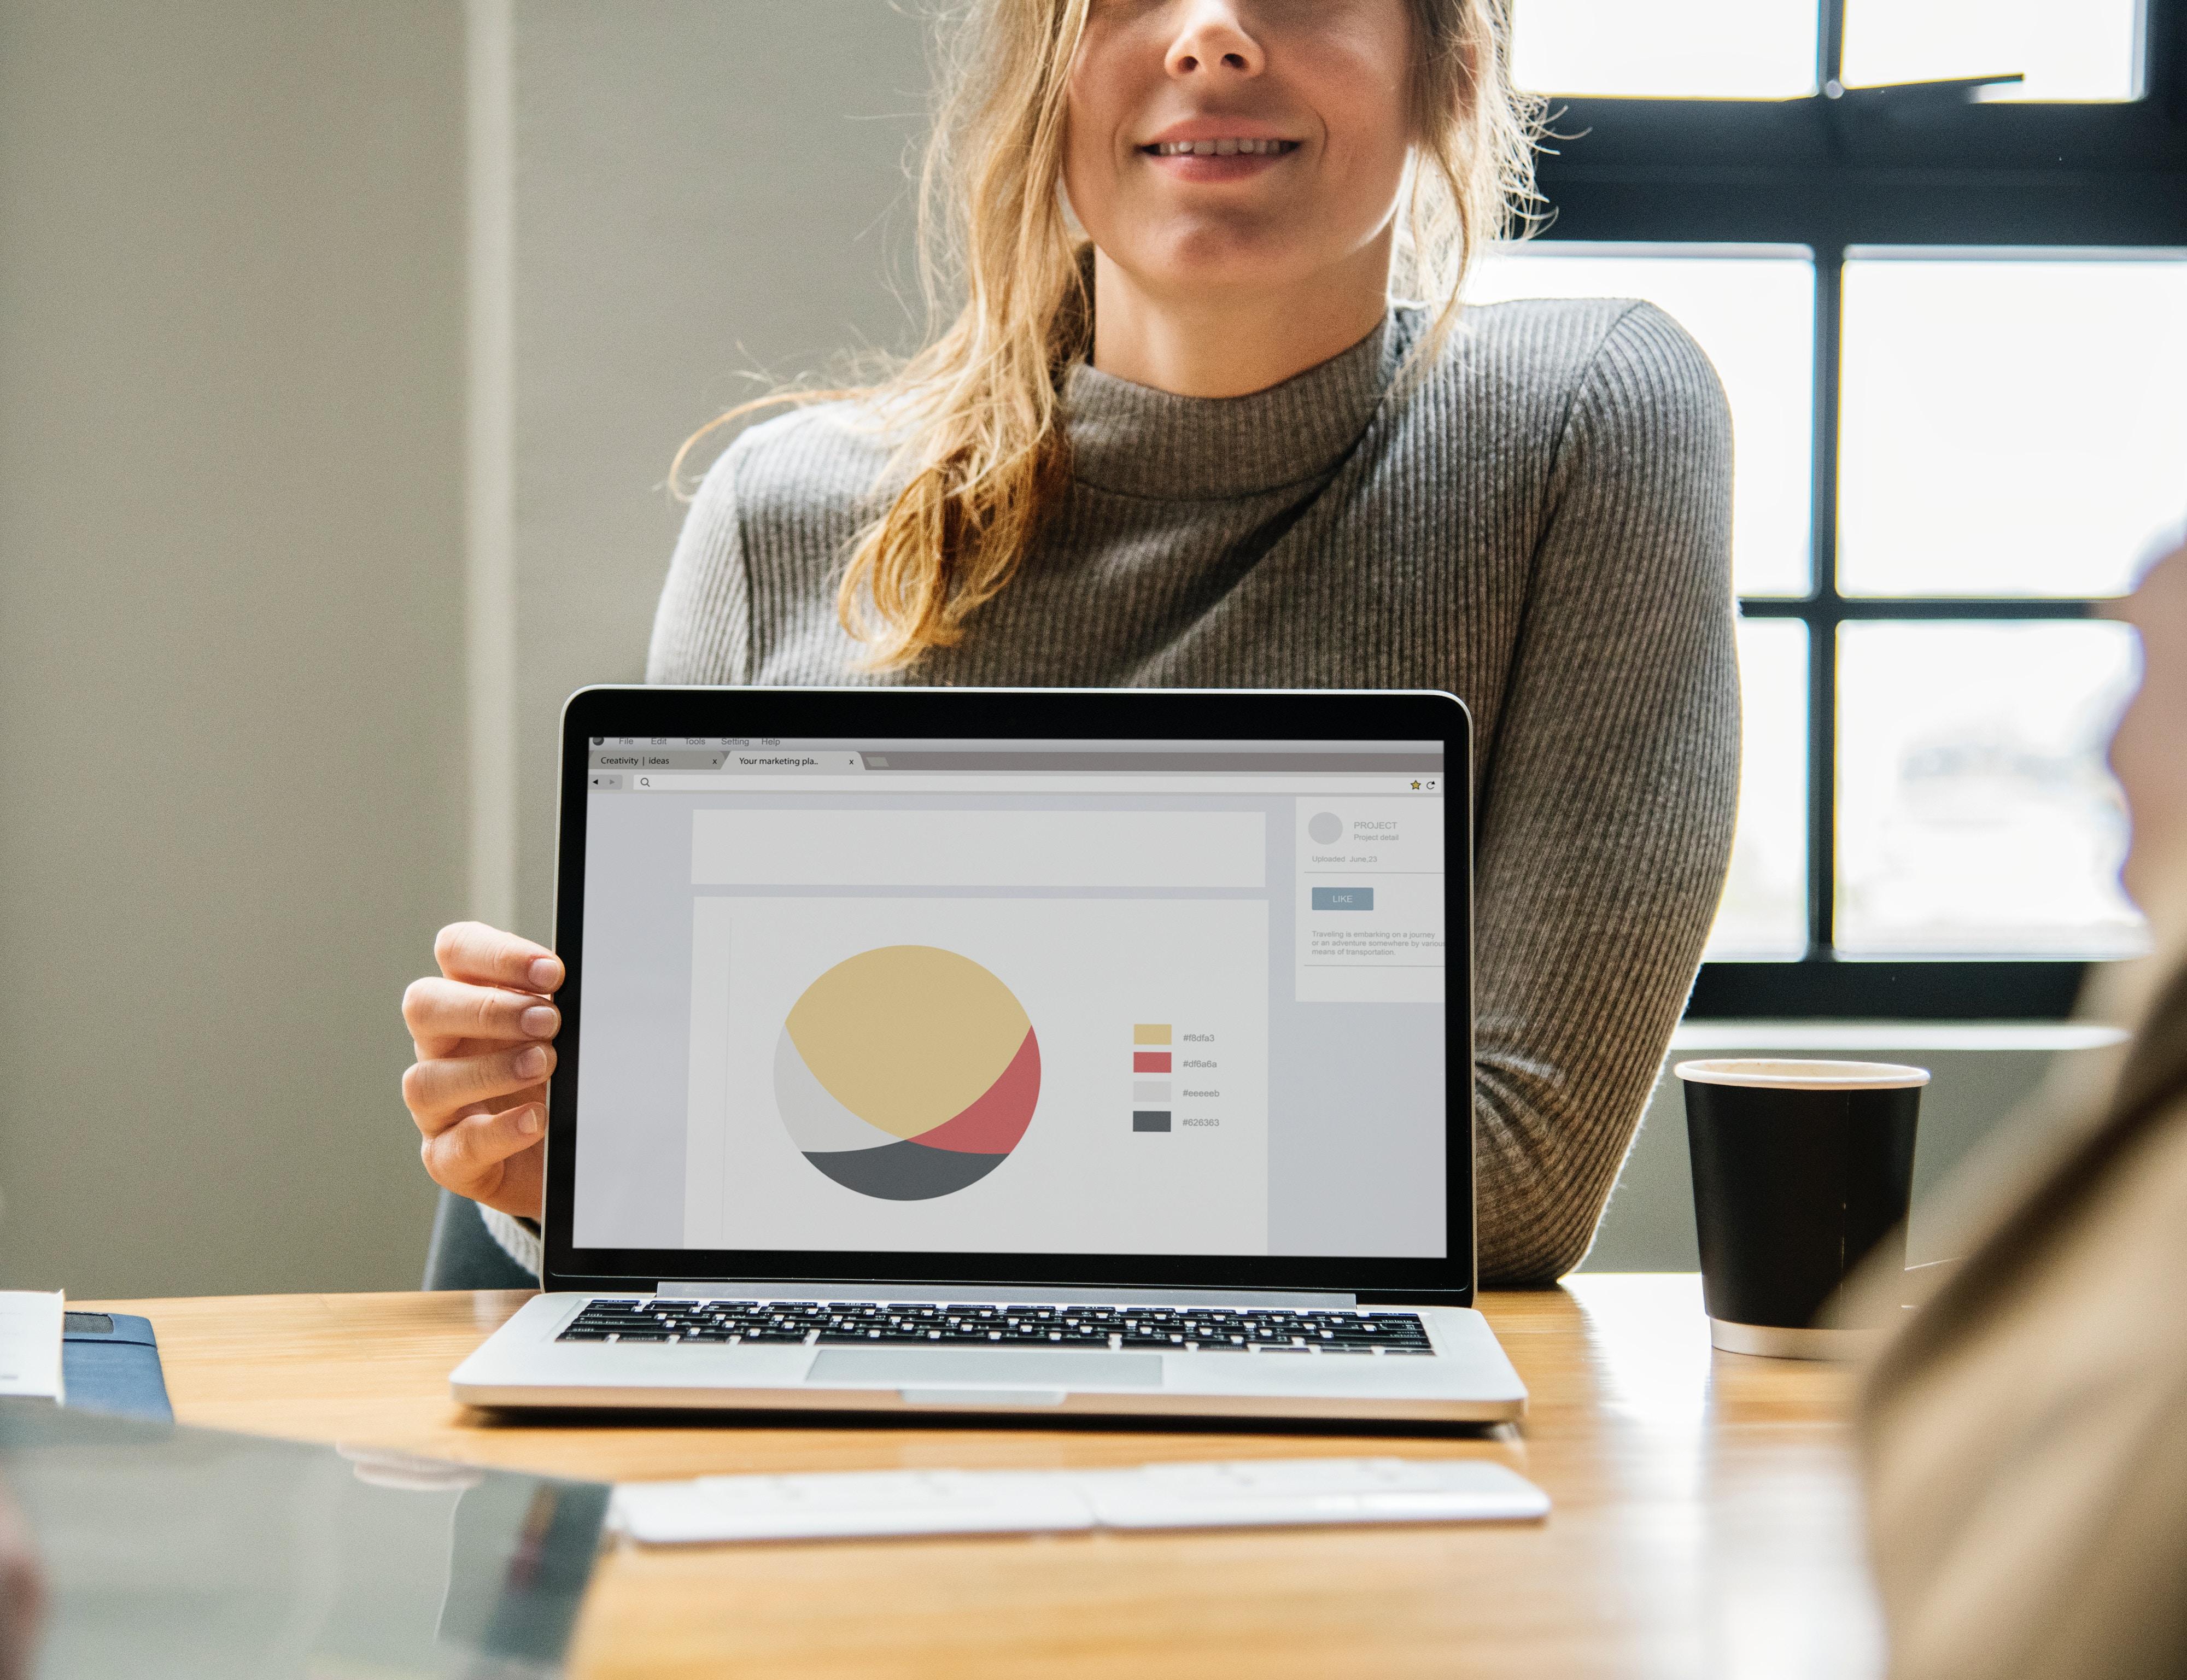 Power BI Data-driven Alerts Make Tracking Easier